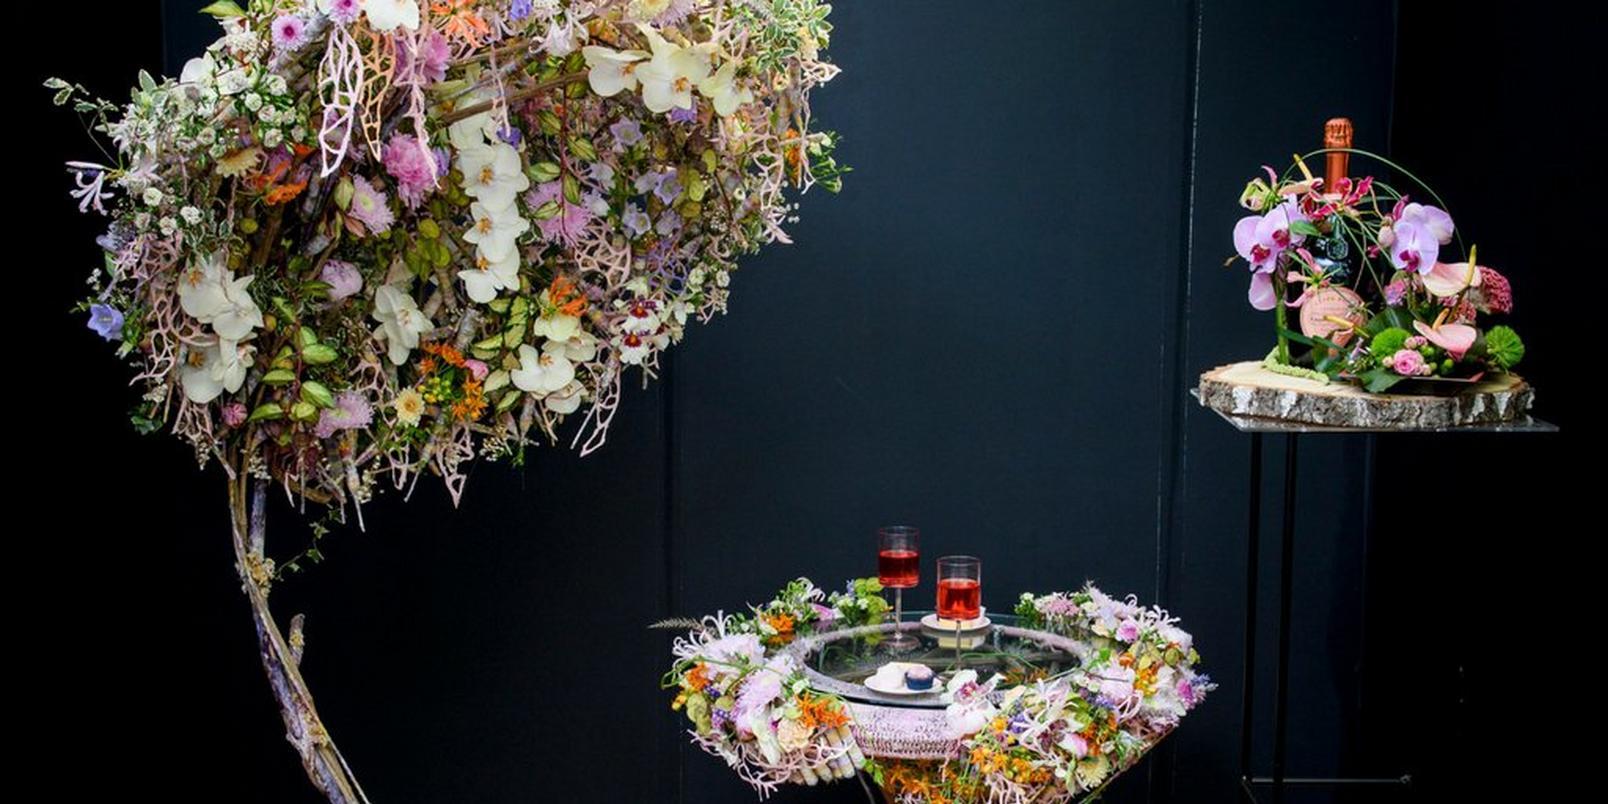 laura-leong-crowned-interflora-florist-year-2018-4